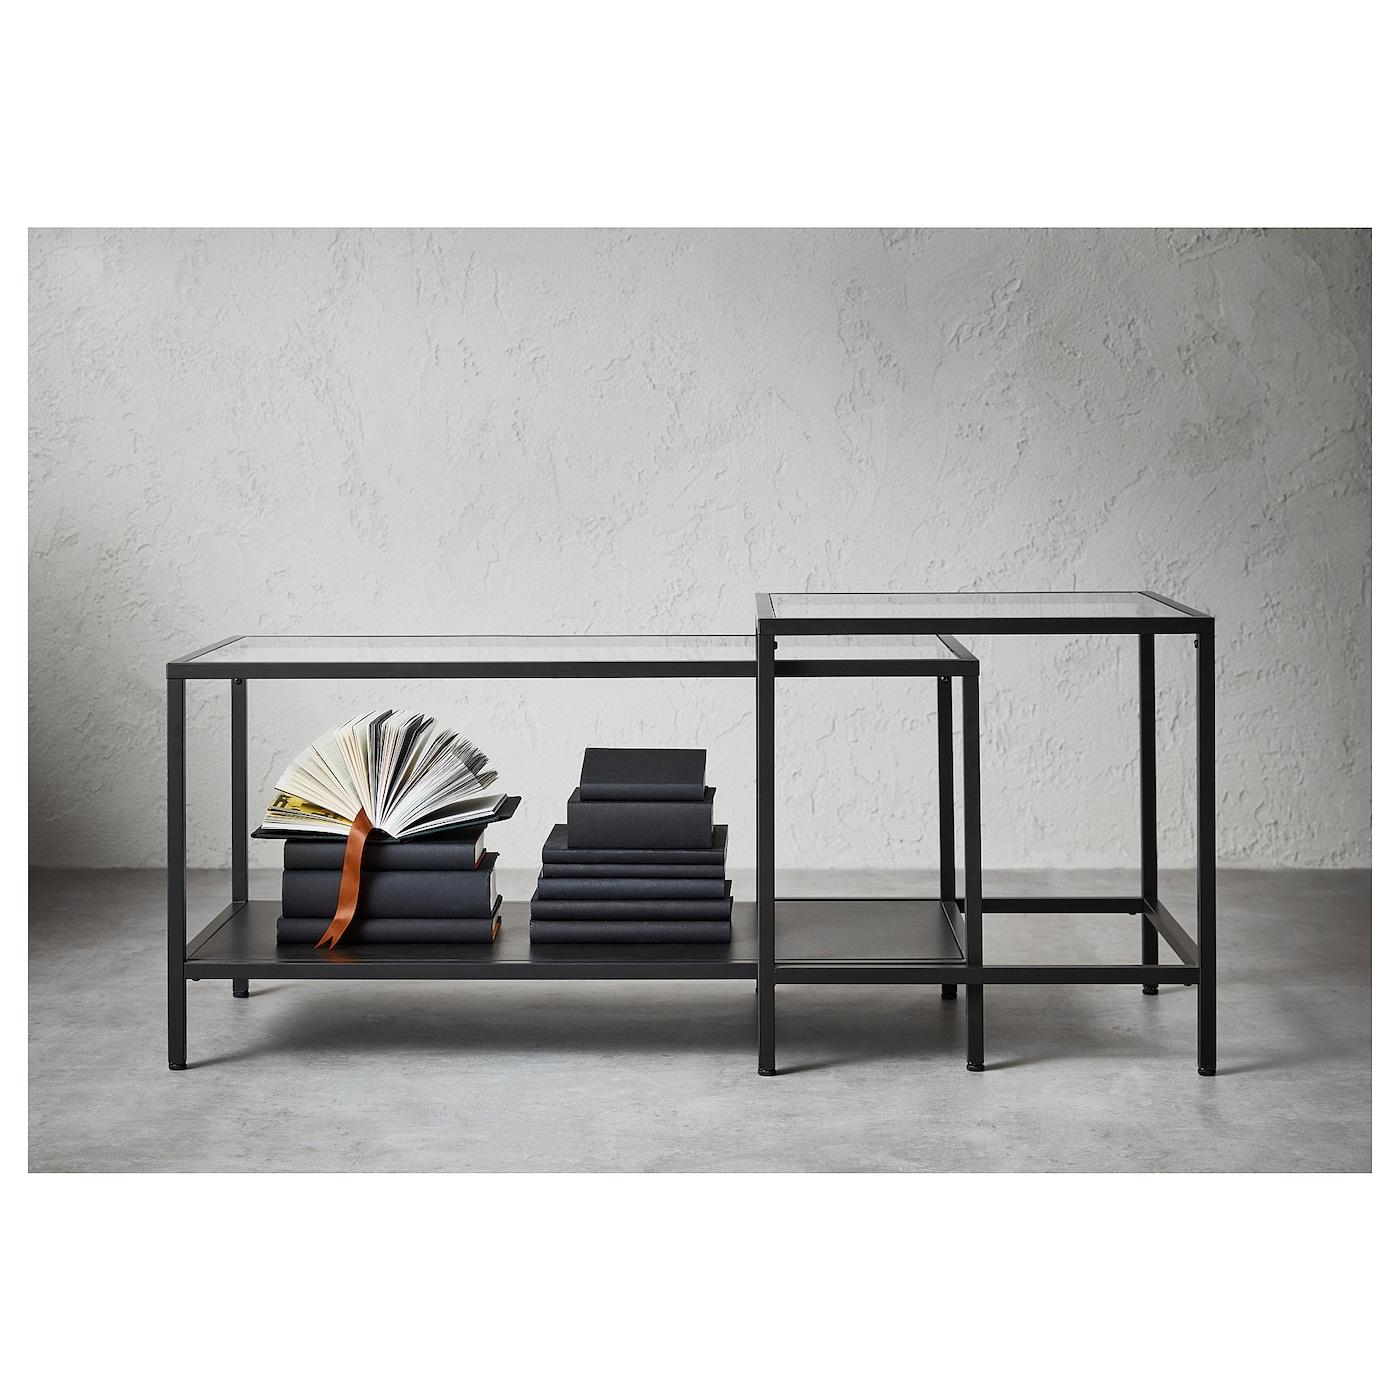 Vittsjö Nesting Tables Set Of 2 Black Brown Glass 353 8x195 8 90x50 Cm Ikea